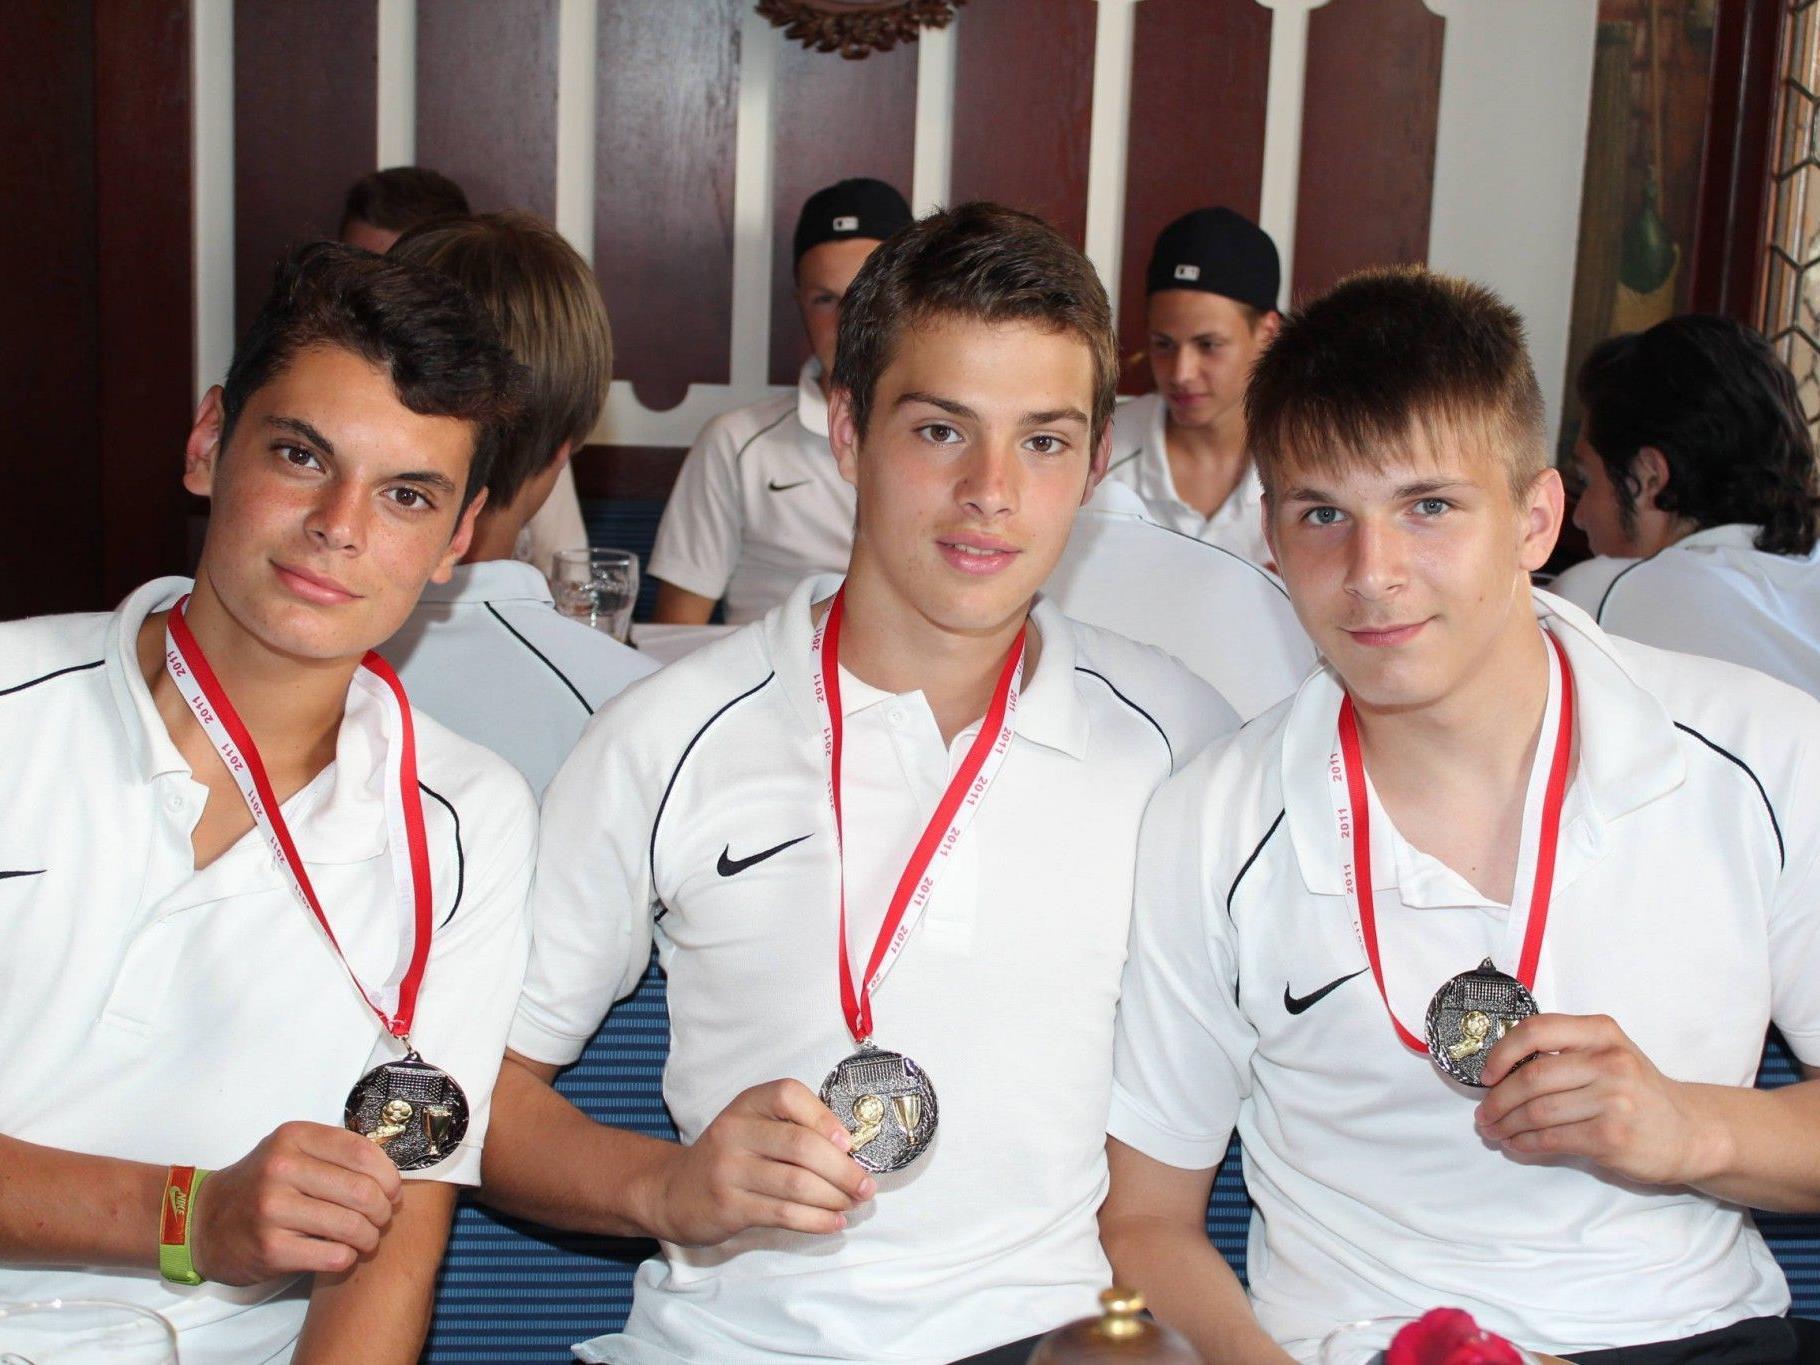 Stolze U17-Nachwuchskicker Reinhard Bergmann, Stefan Jakovljevic und Stefan Jasovic.